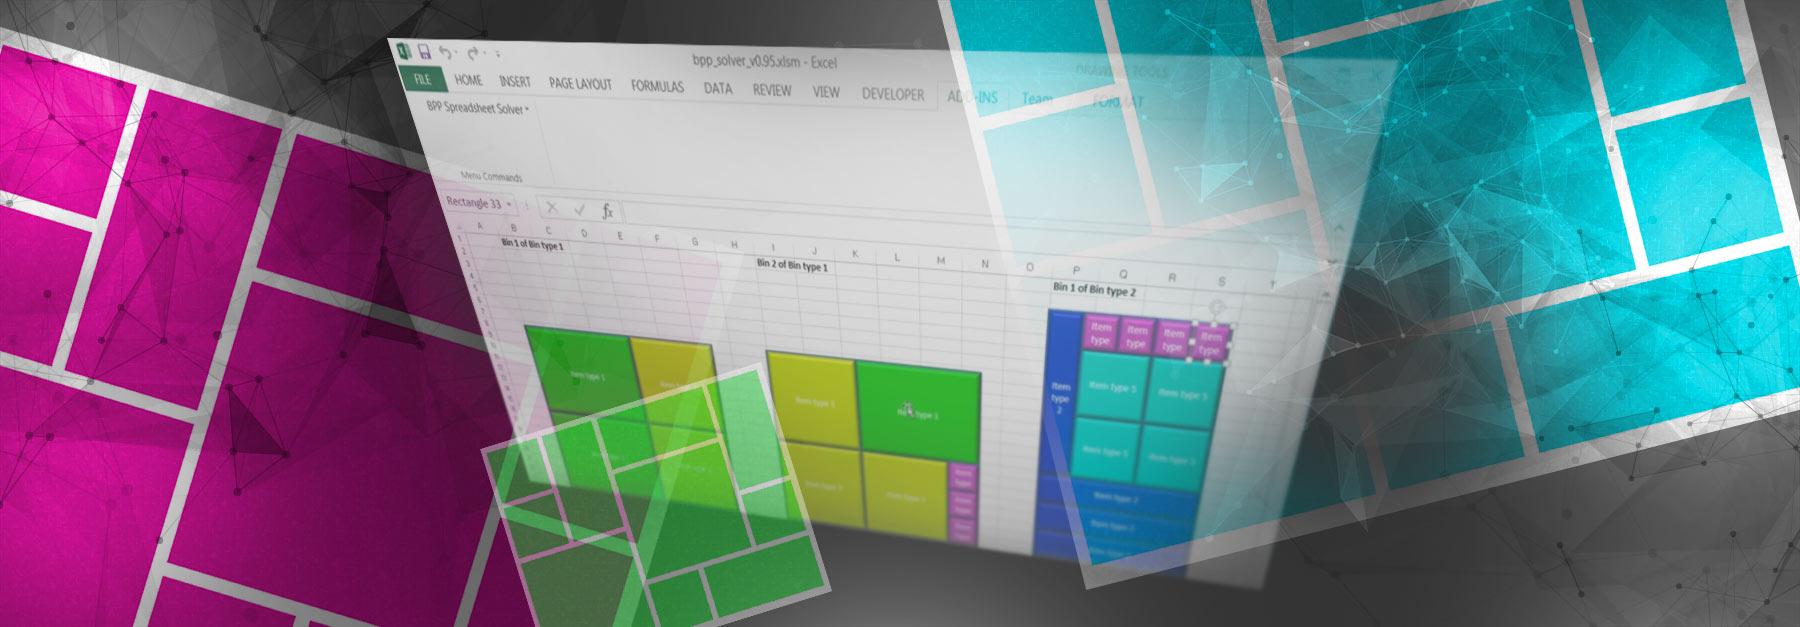 BPP Spreadsheet Solver